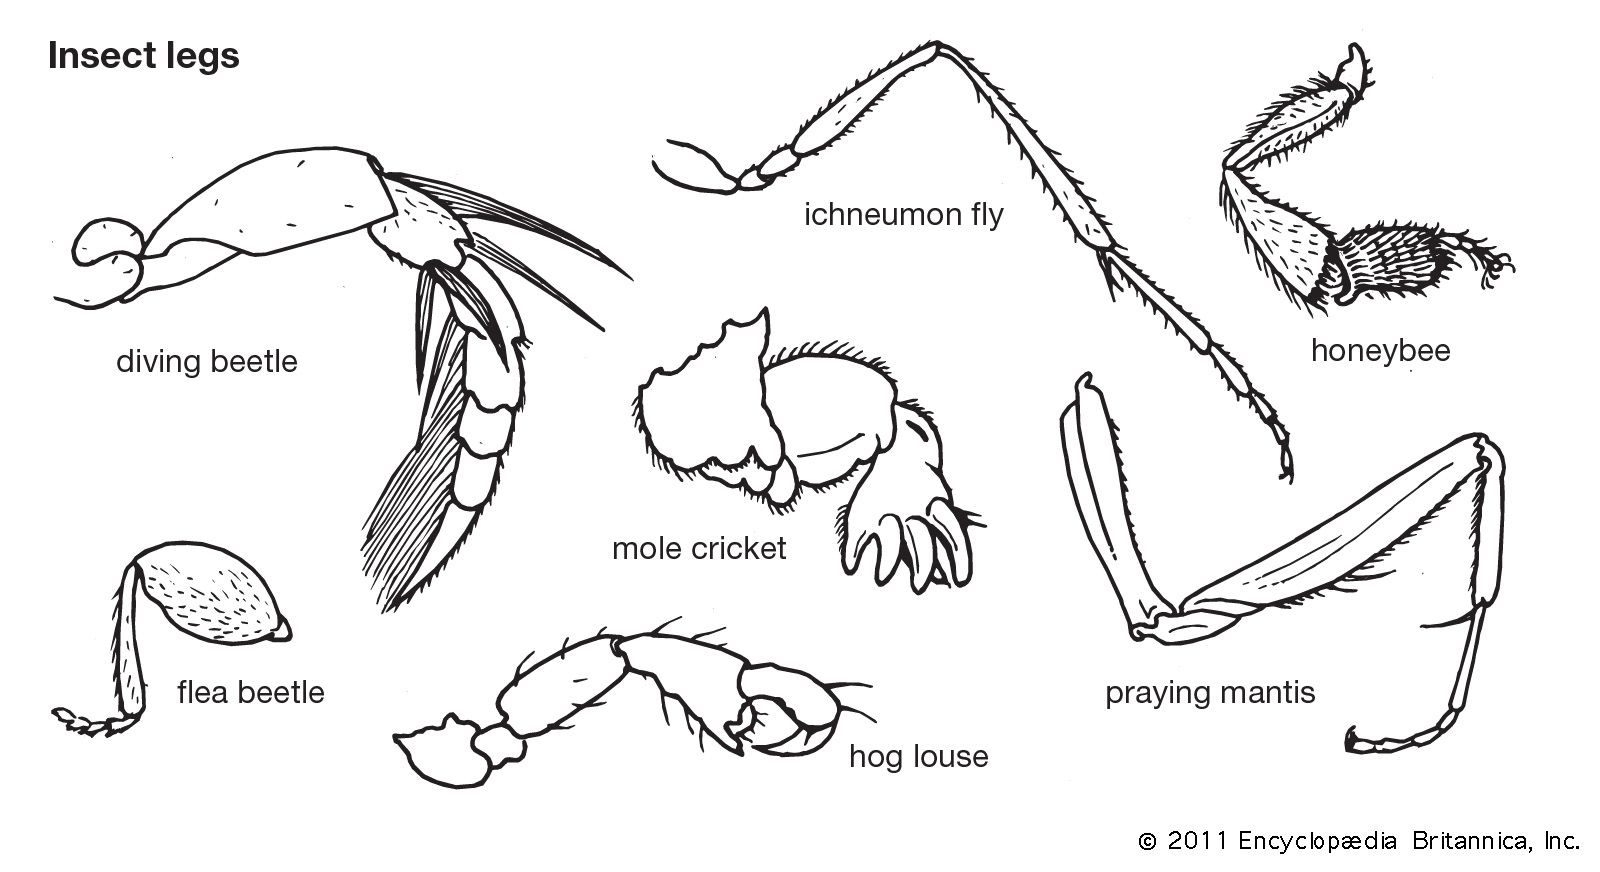 108456-050-1F0E1784.jpg (1600×872) | Insect Anatomy | Pinterest ...